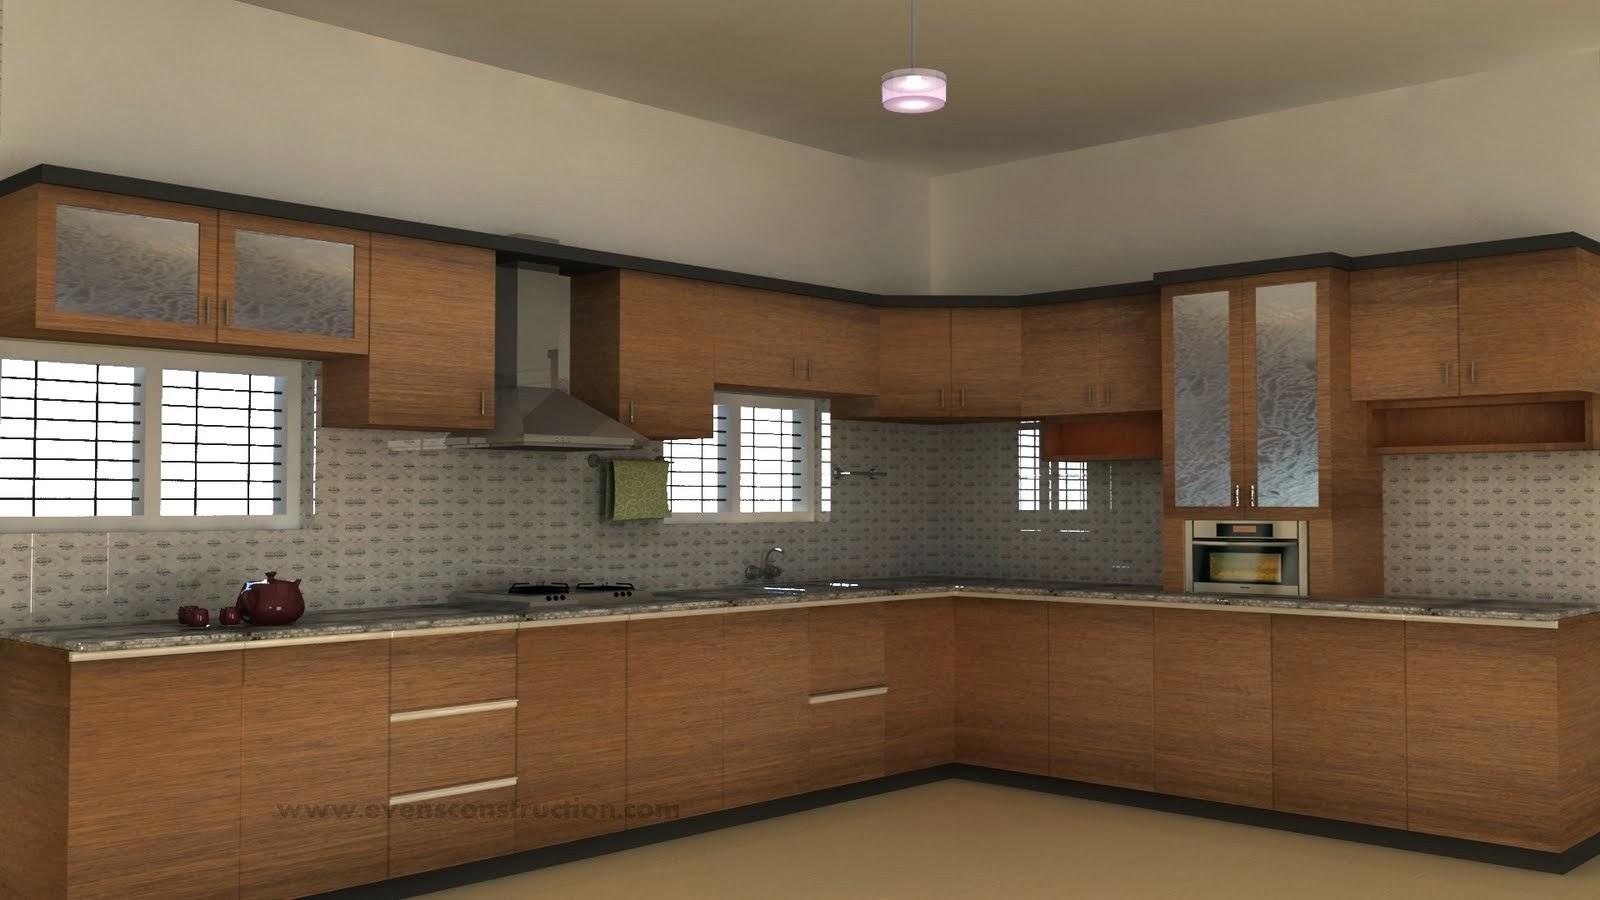 House construction kerala house construction tips for Construction tips